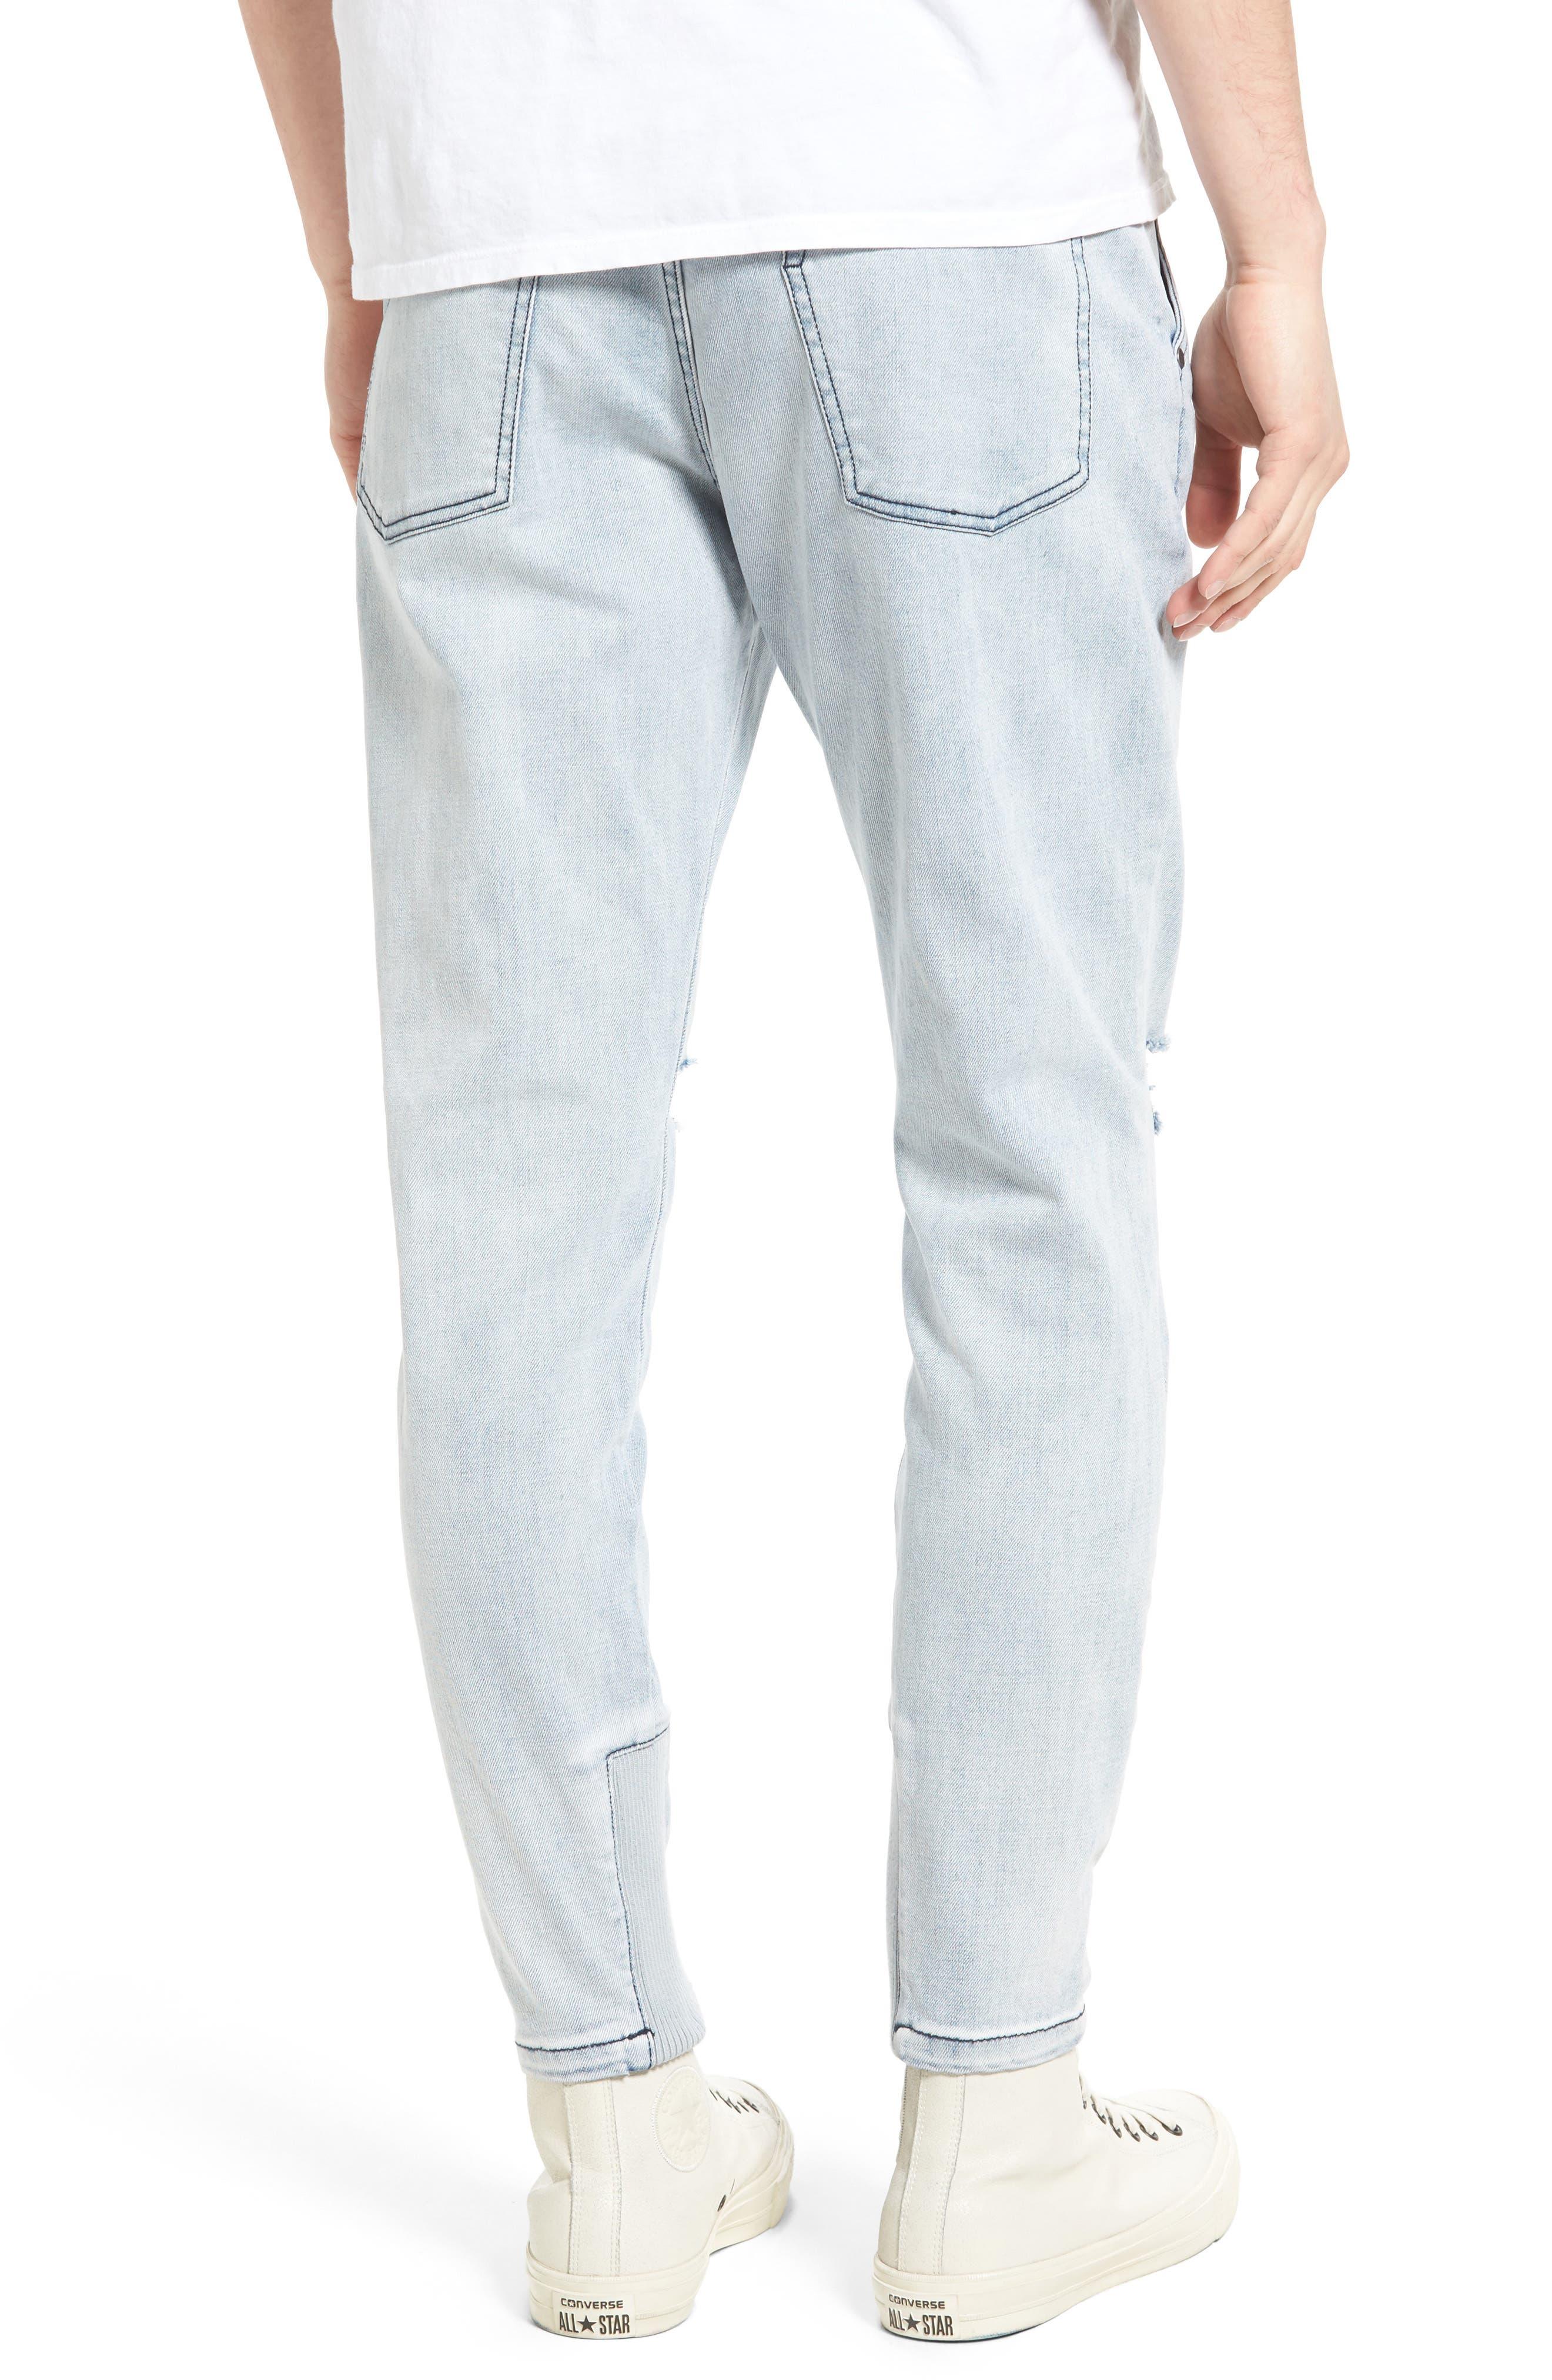 Sharpshot Slouchy Skinny Fit Denim Pants,                             Alternate thumbnail 4, color,